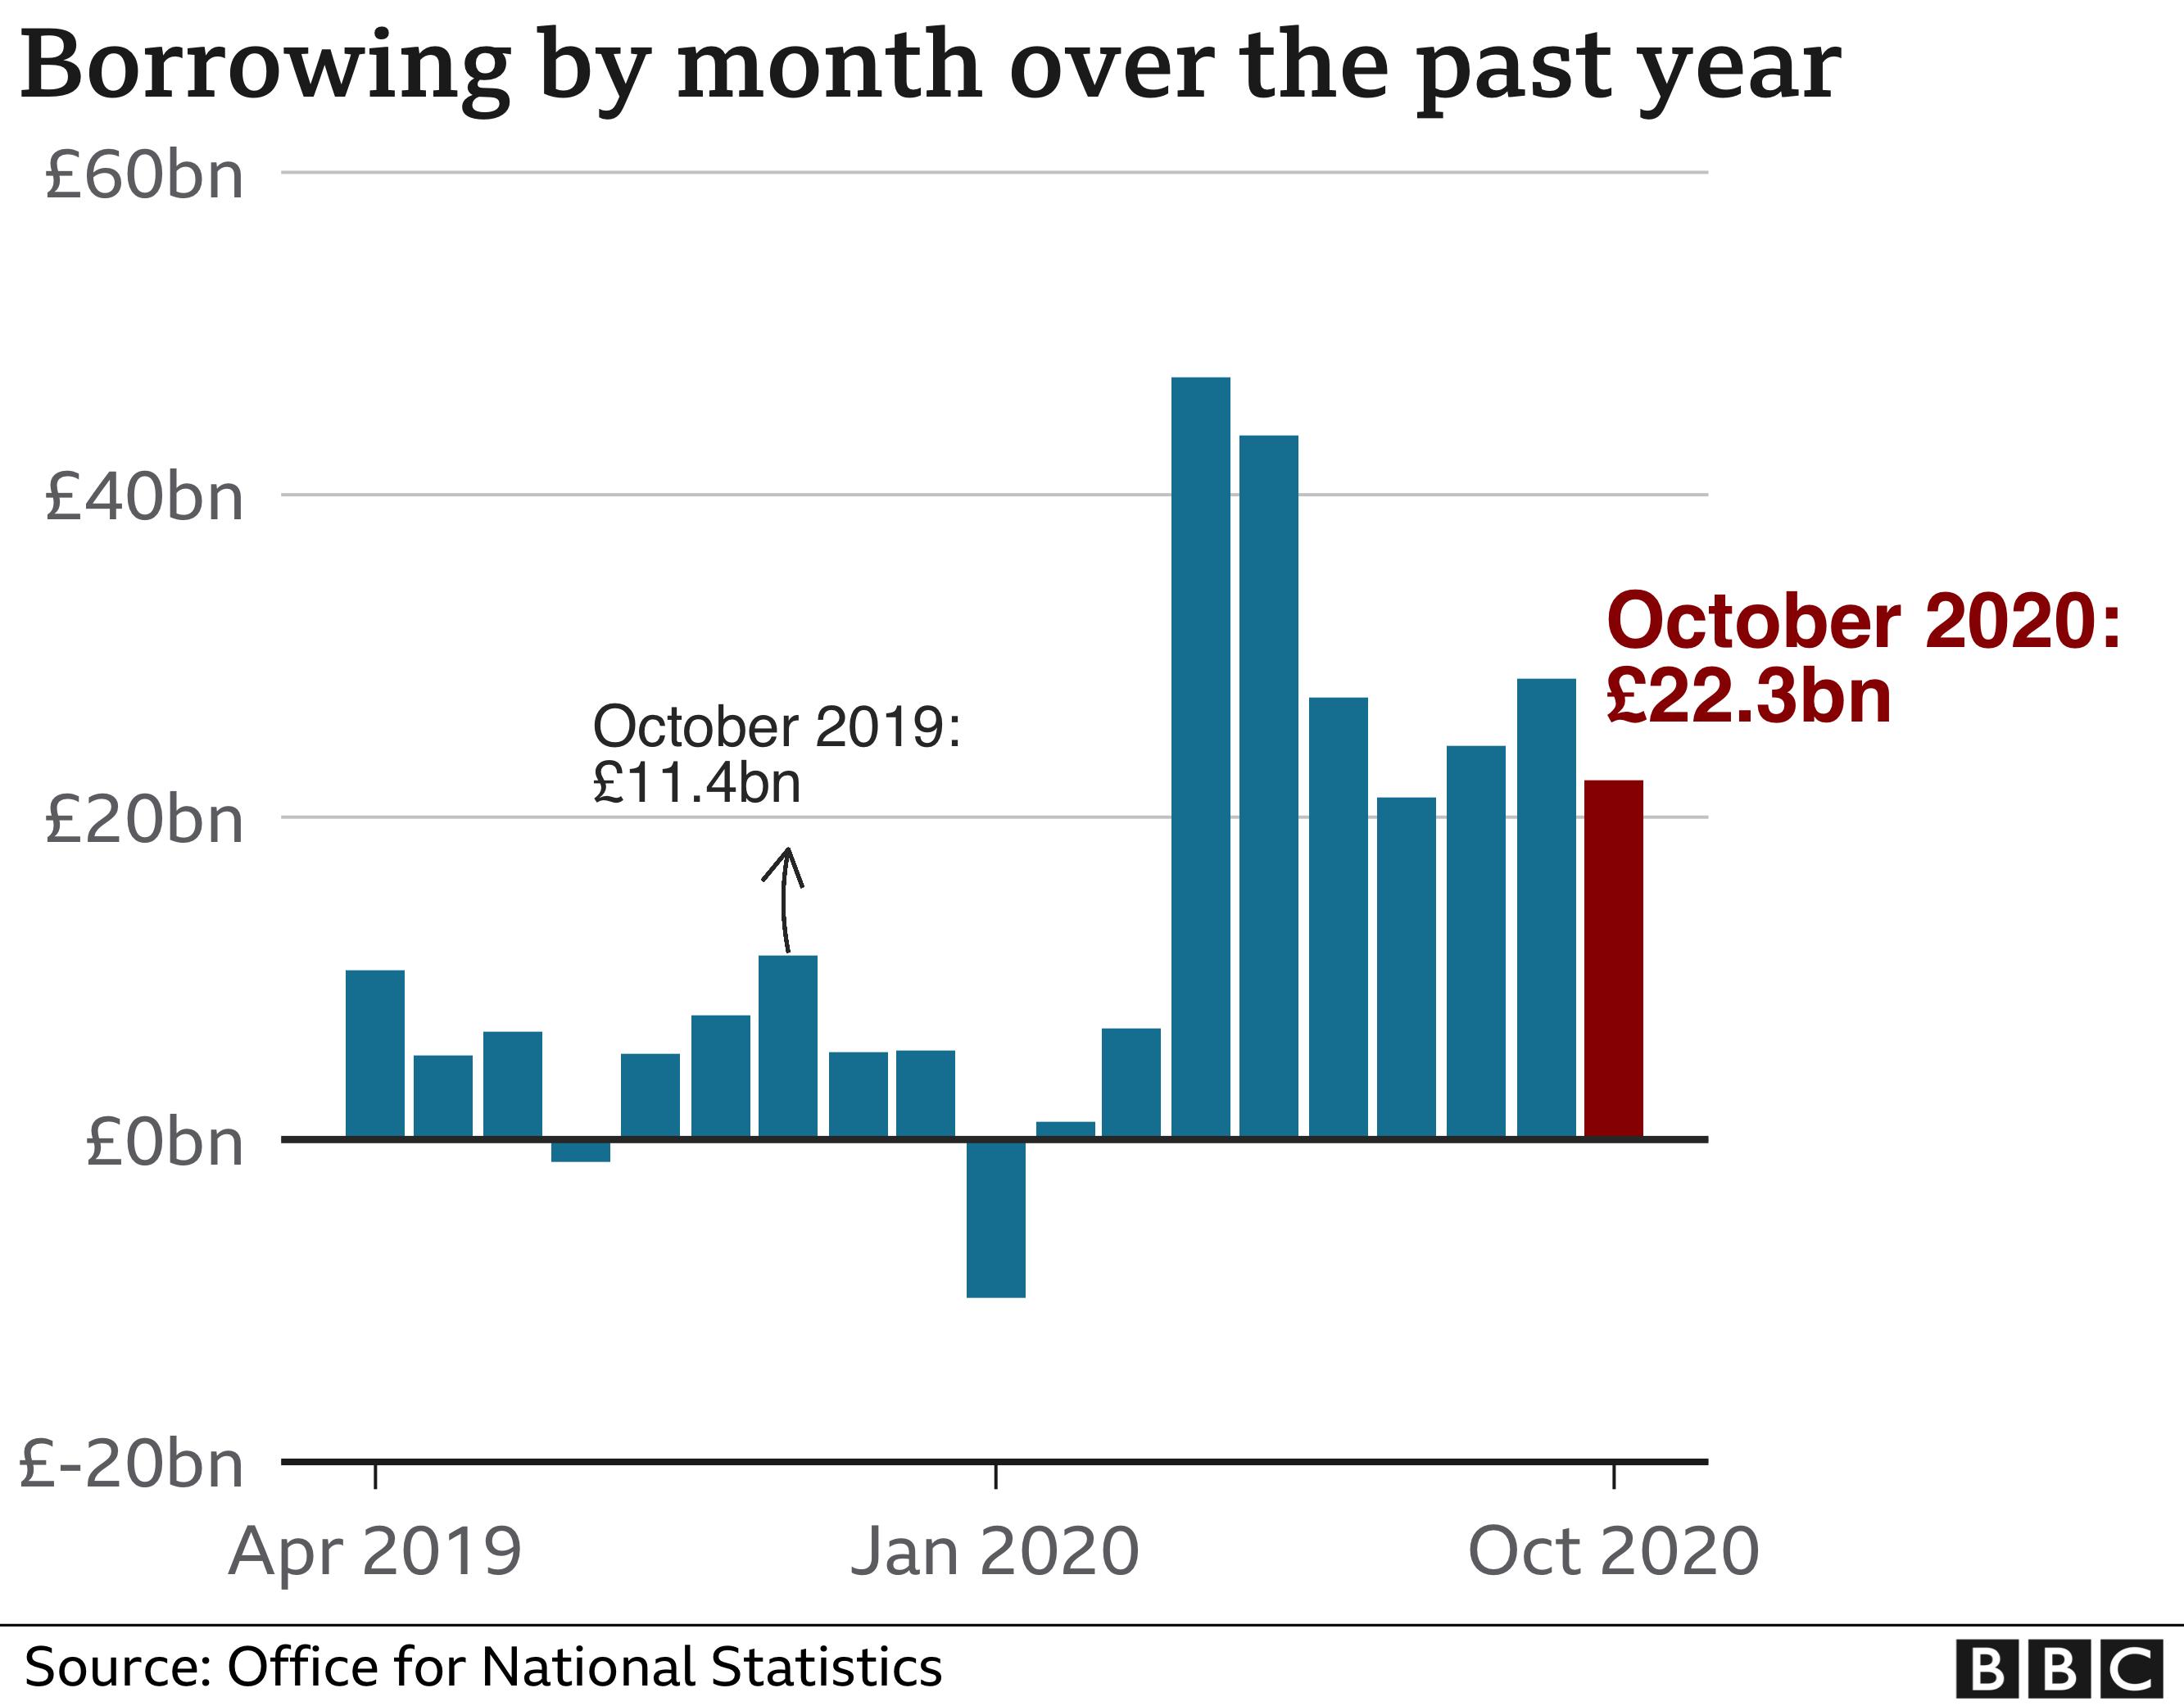 UK borrowing hits highest October level on record thumbnail